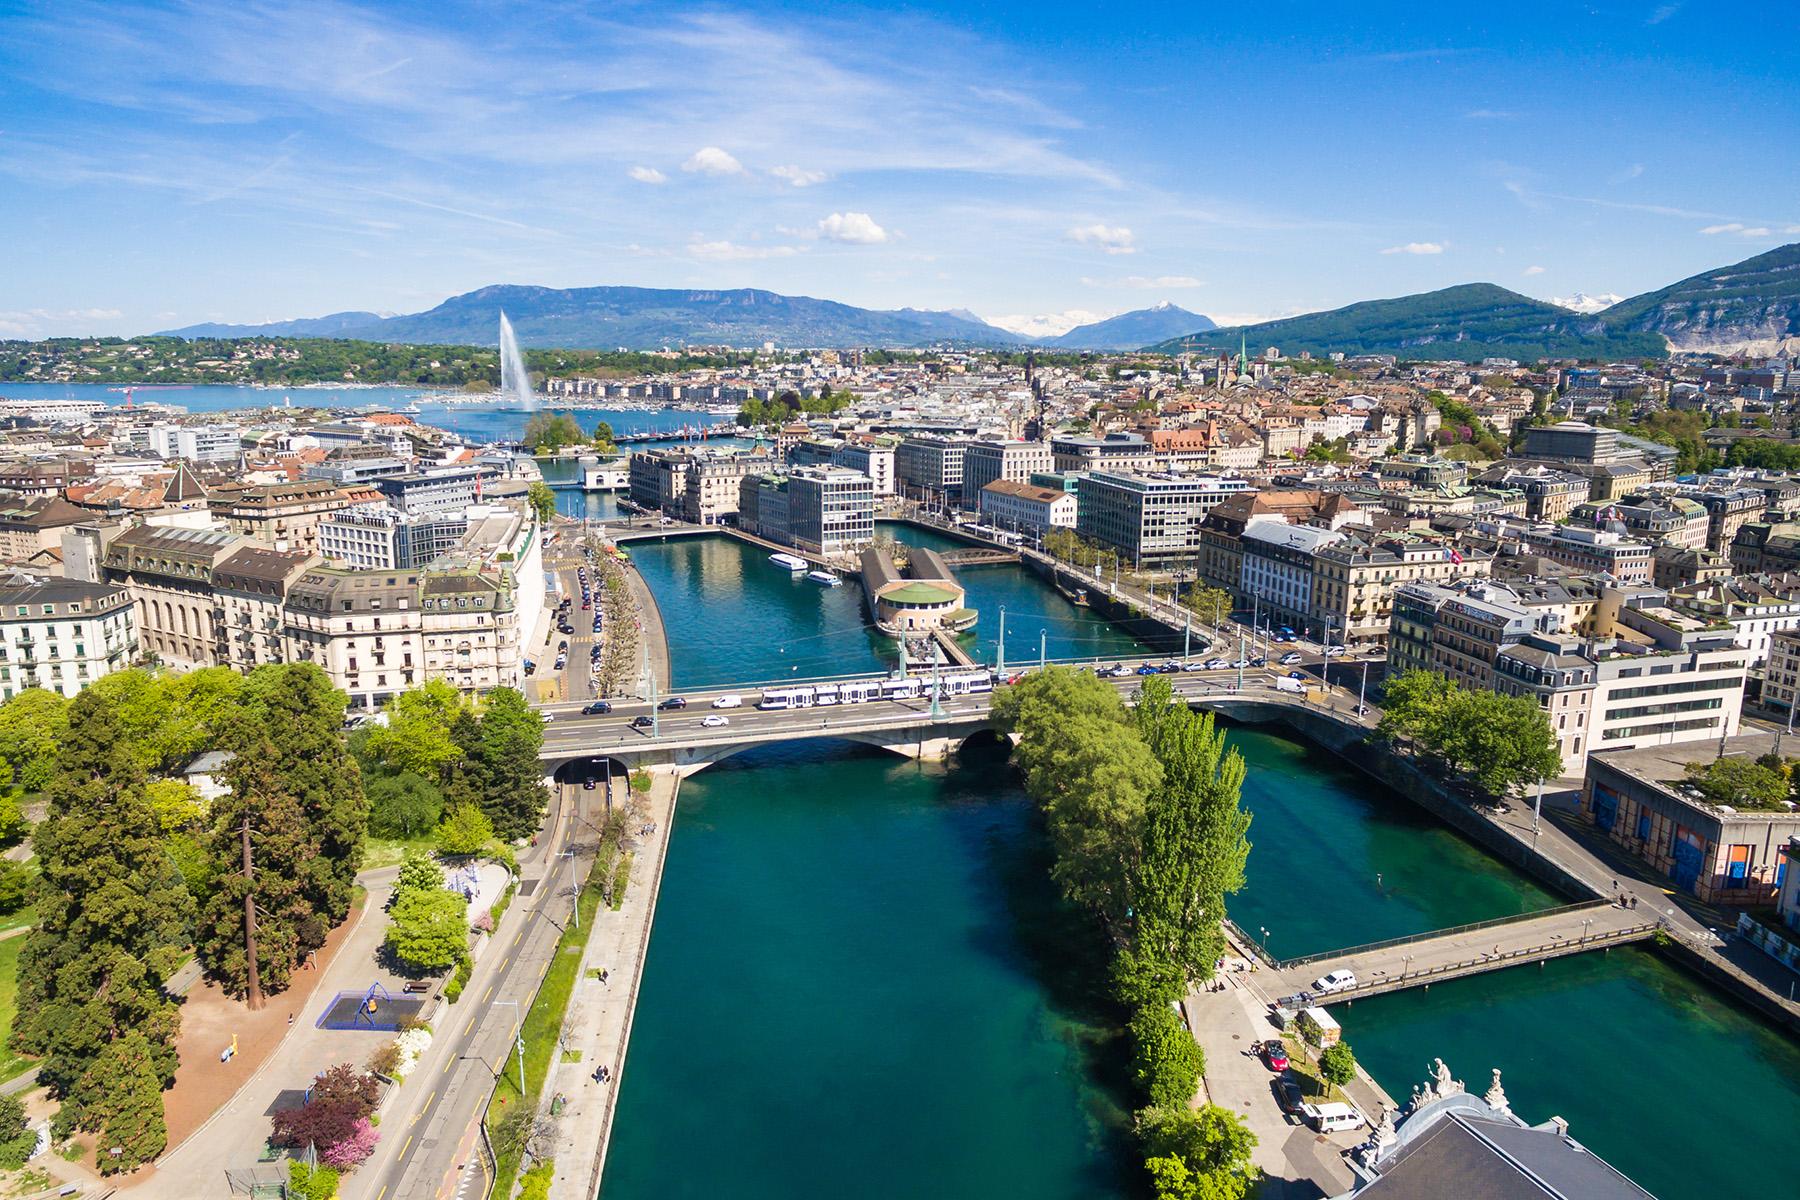 The skyline of Geneva